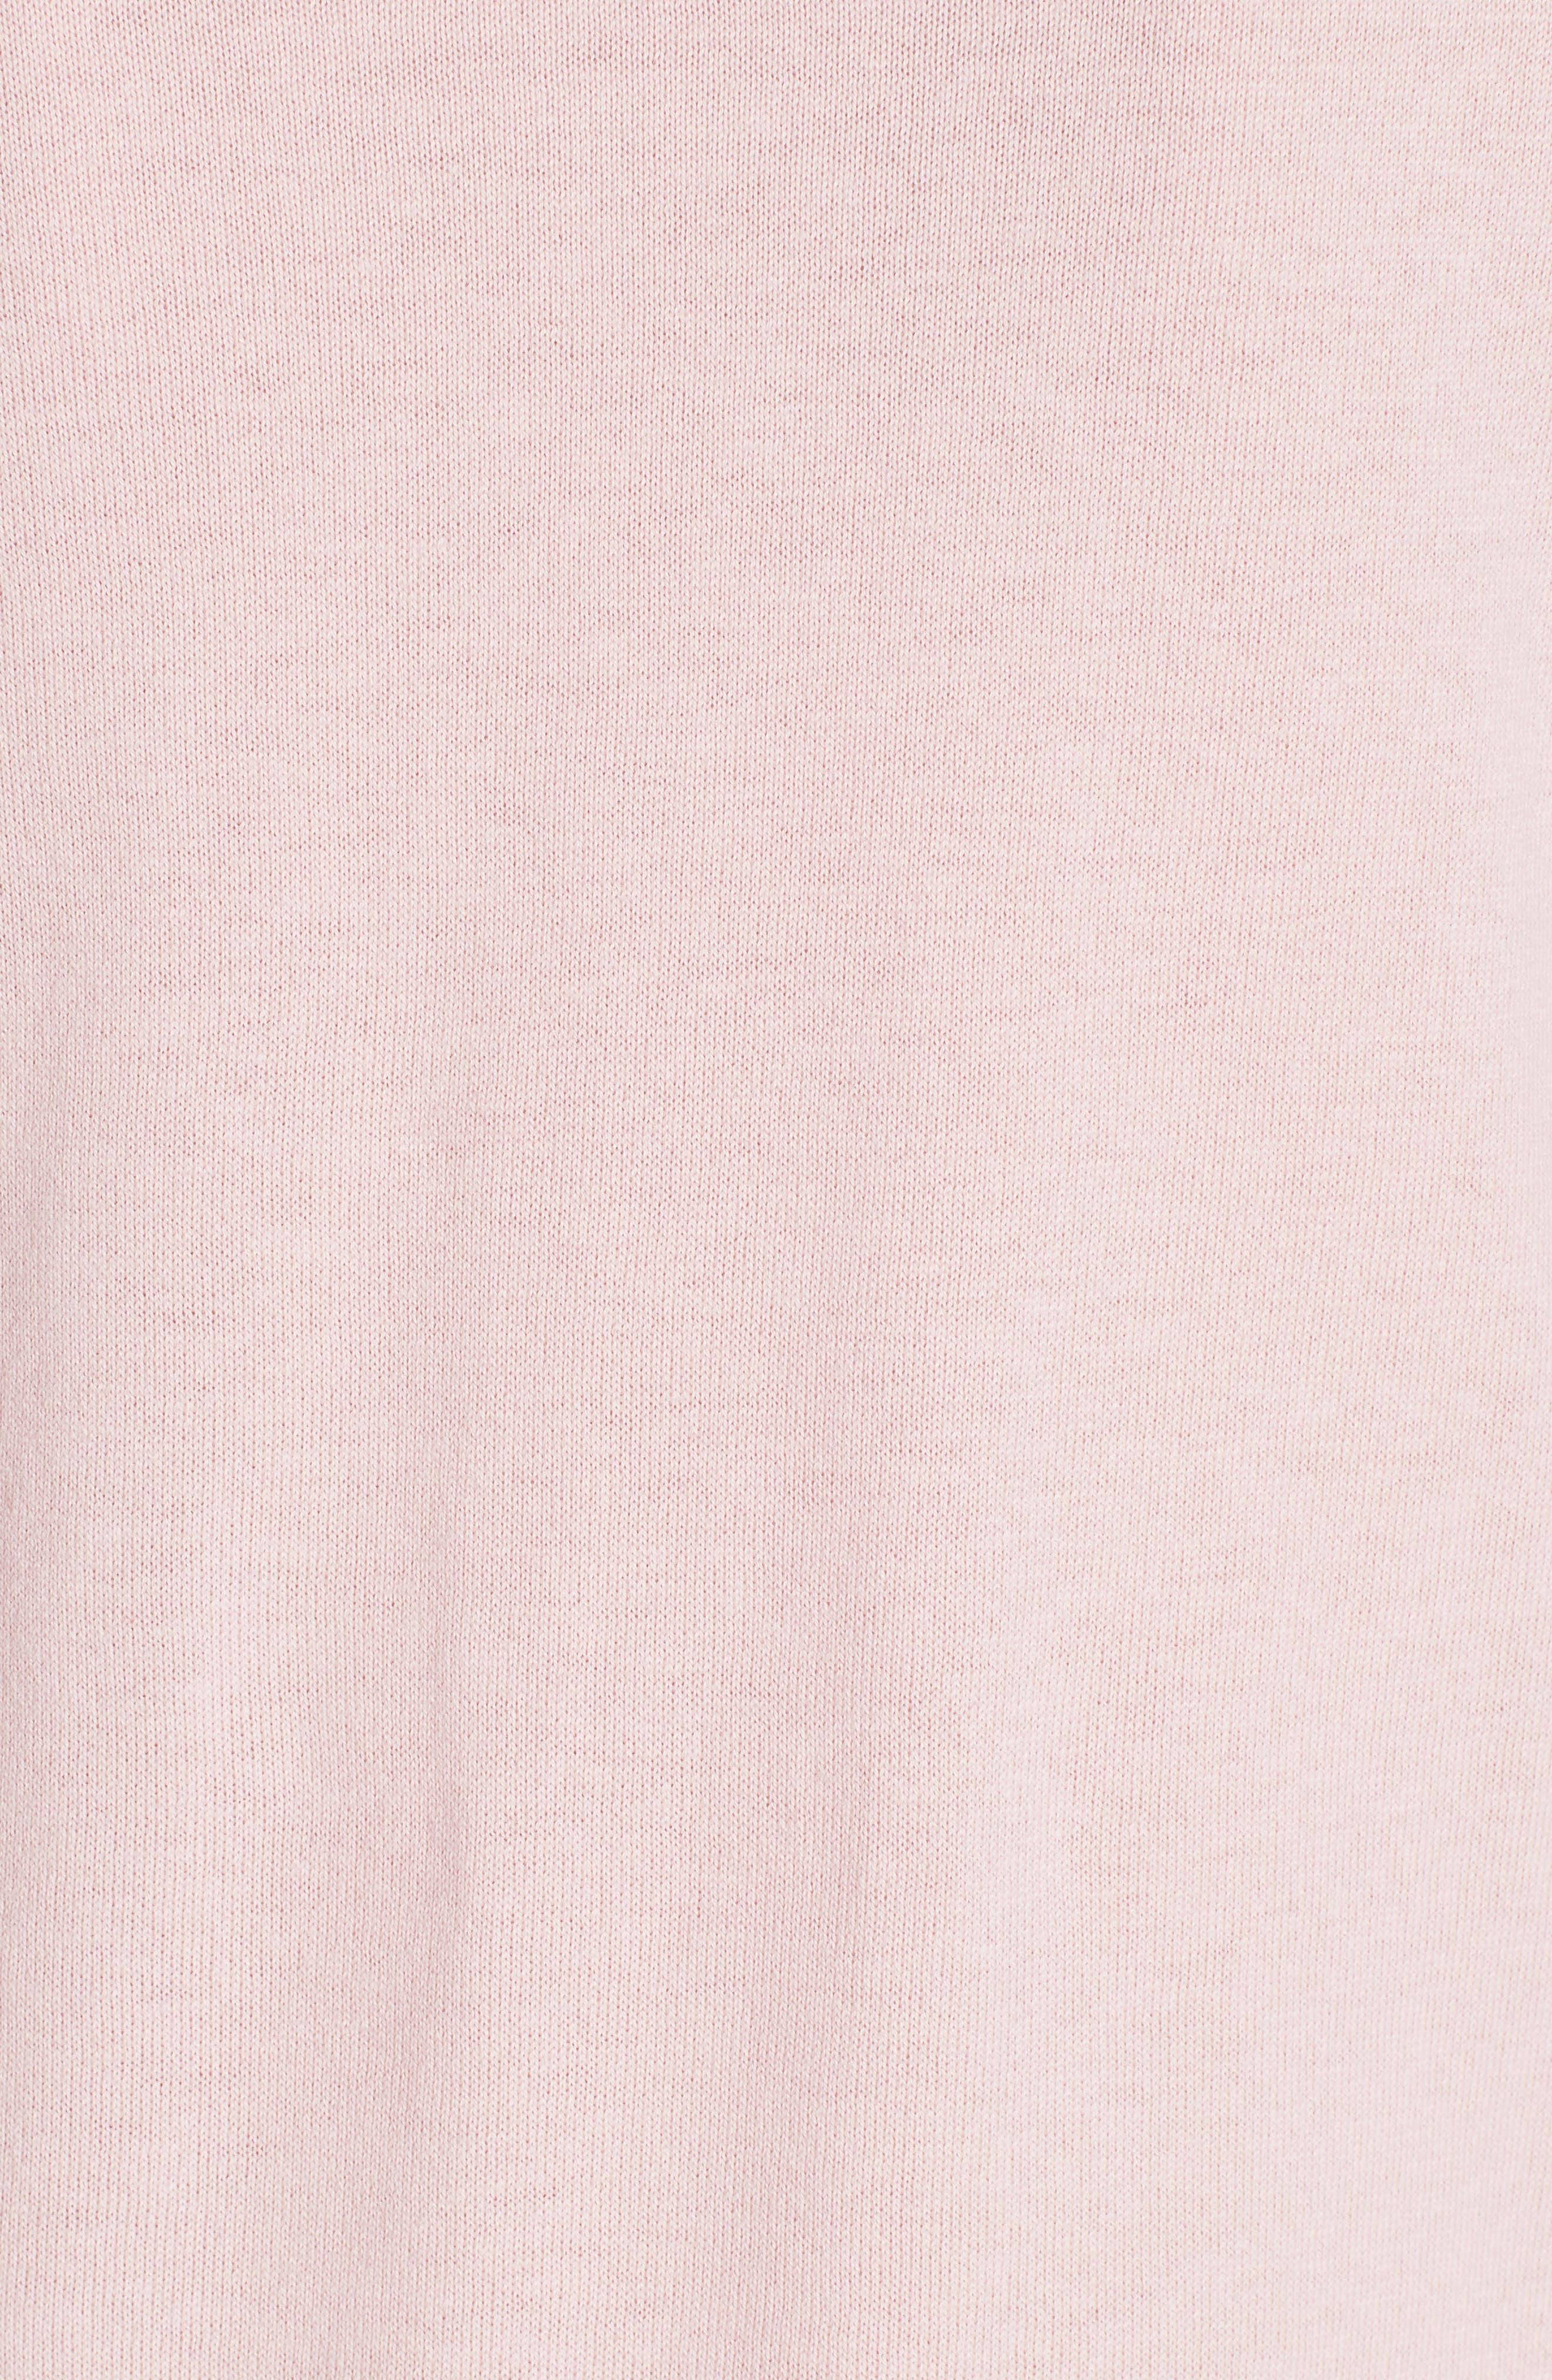 Nansea Floral Collar Tiered Hem Sweater,                             Alternate thumbnail 5, color,                             PINK